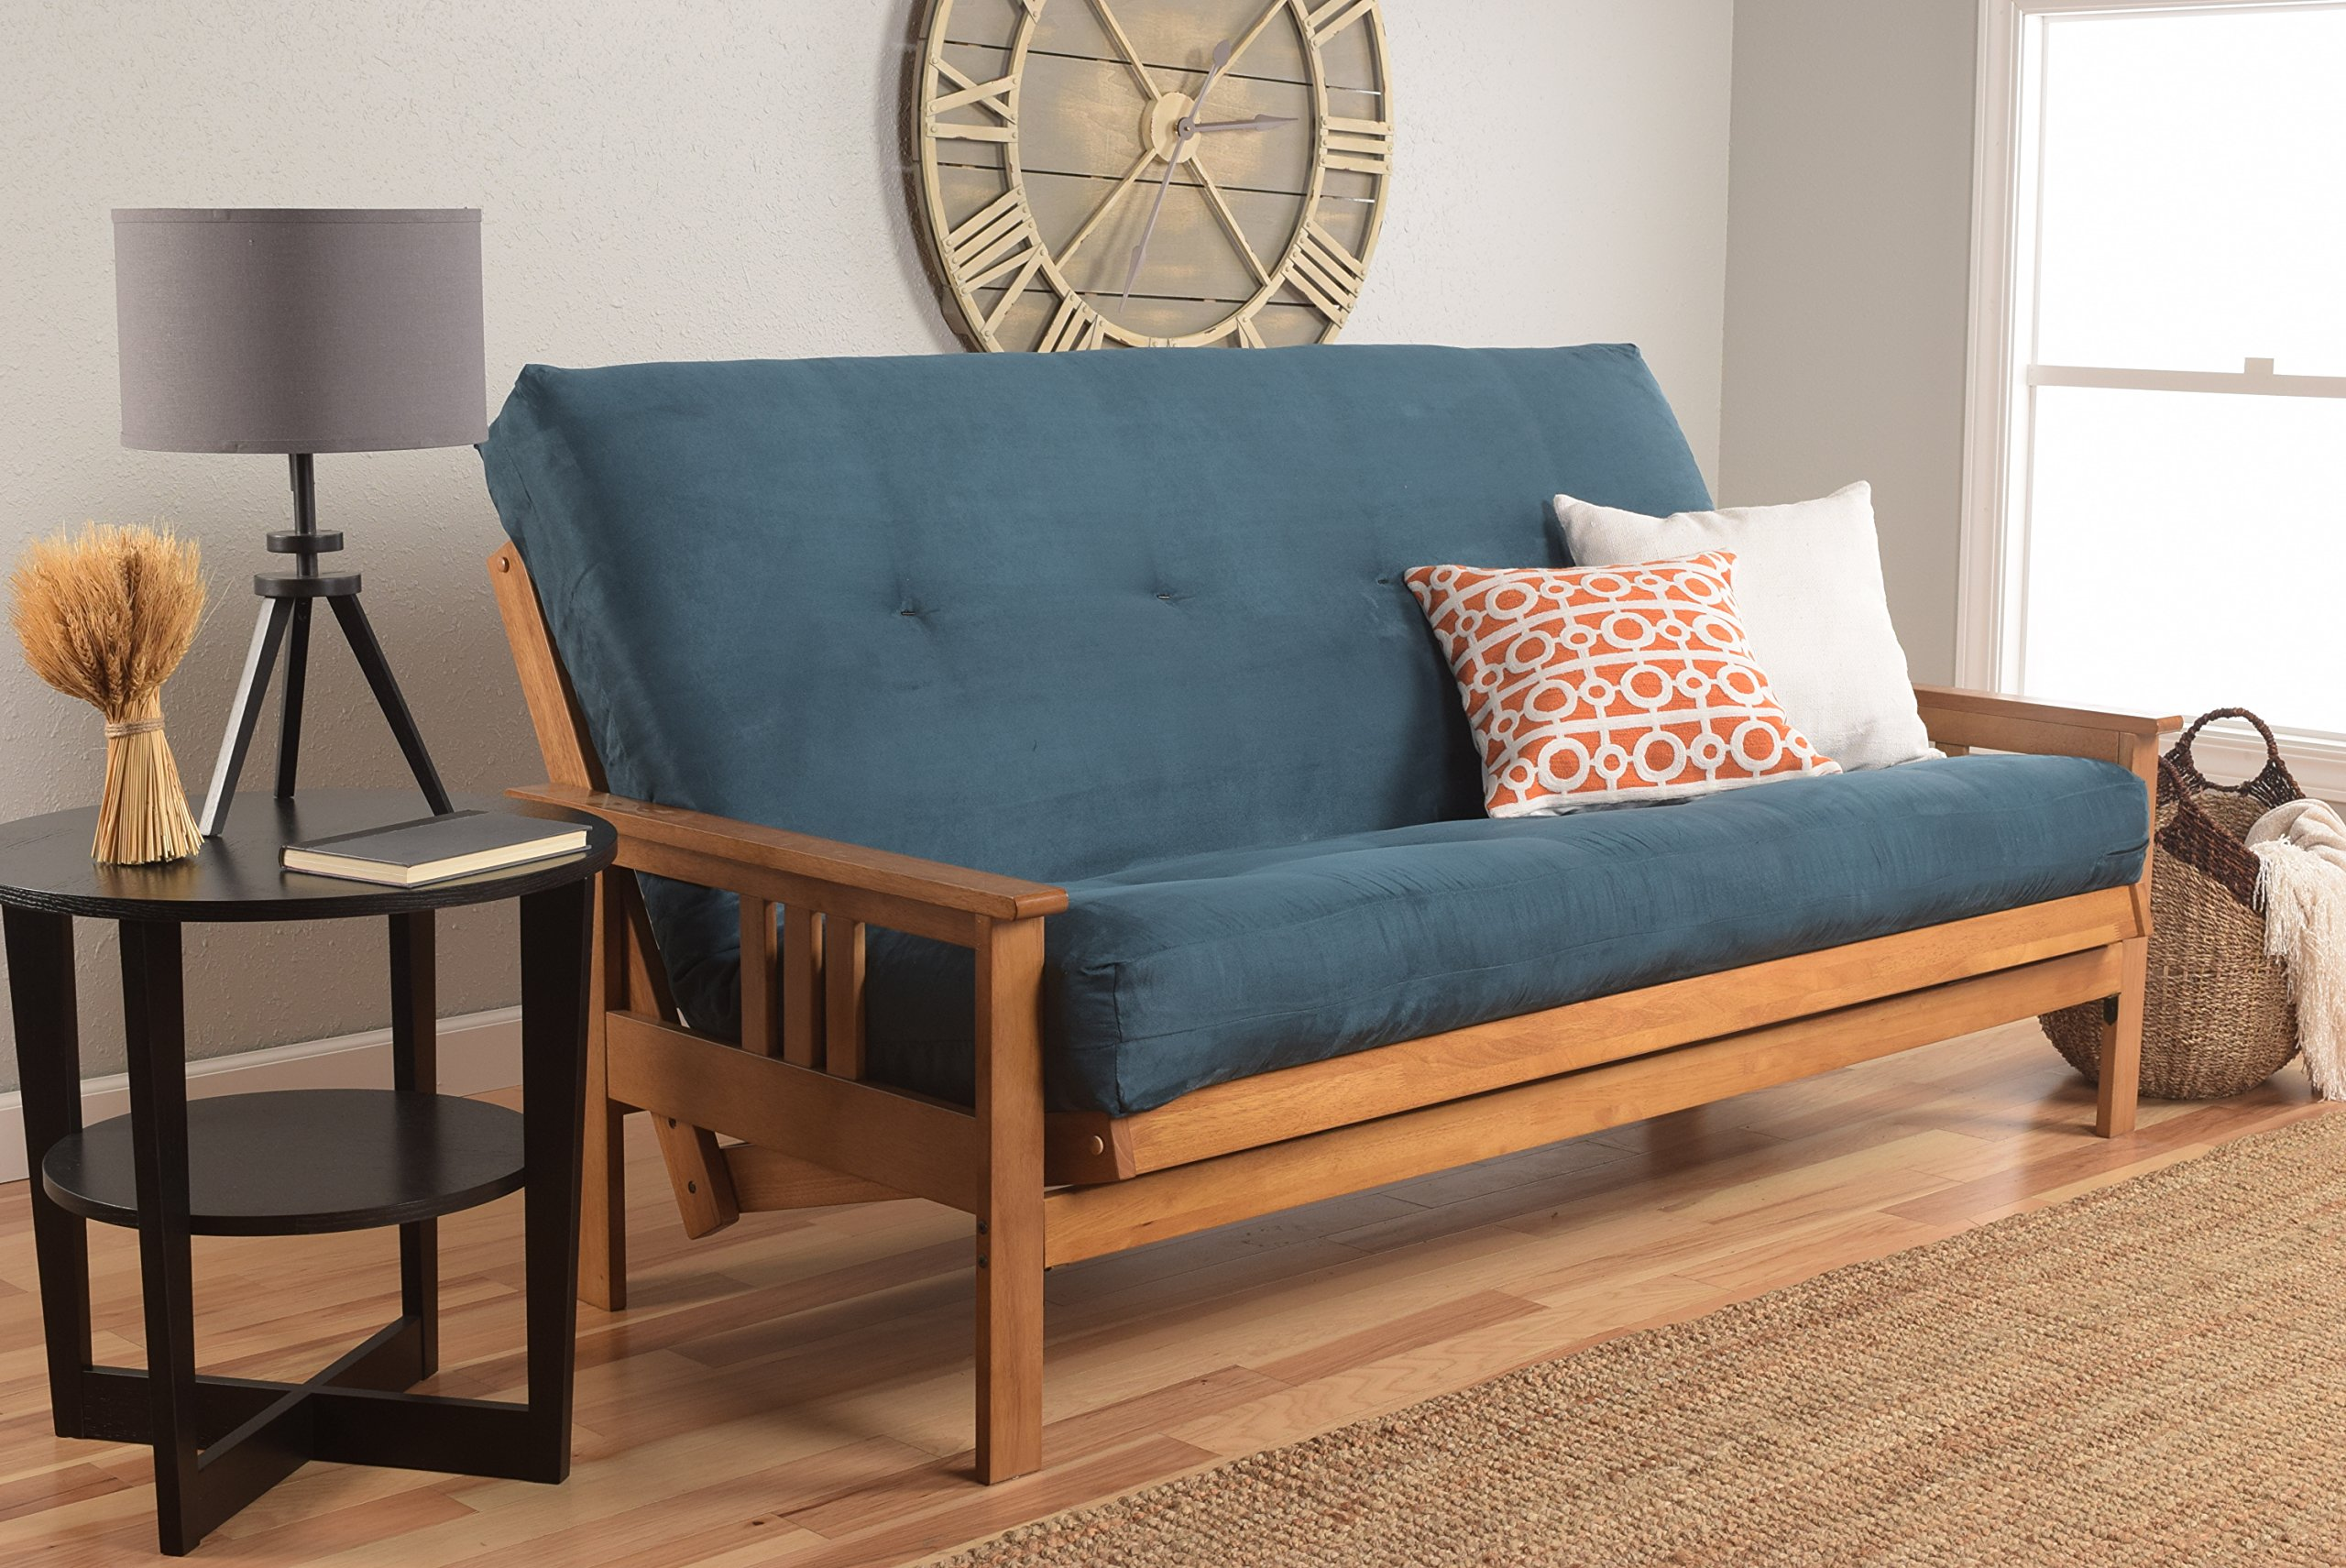 Kodiak Furniture KFMOBTSNAVYLF5MD3 Monterey Futon Set with Butternut Finish, Full, Suede Navy by Kodiak Furniture